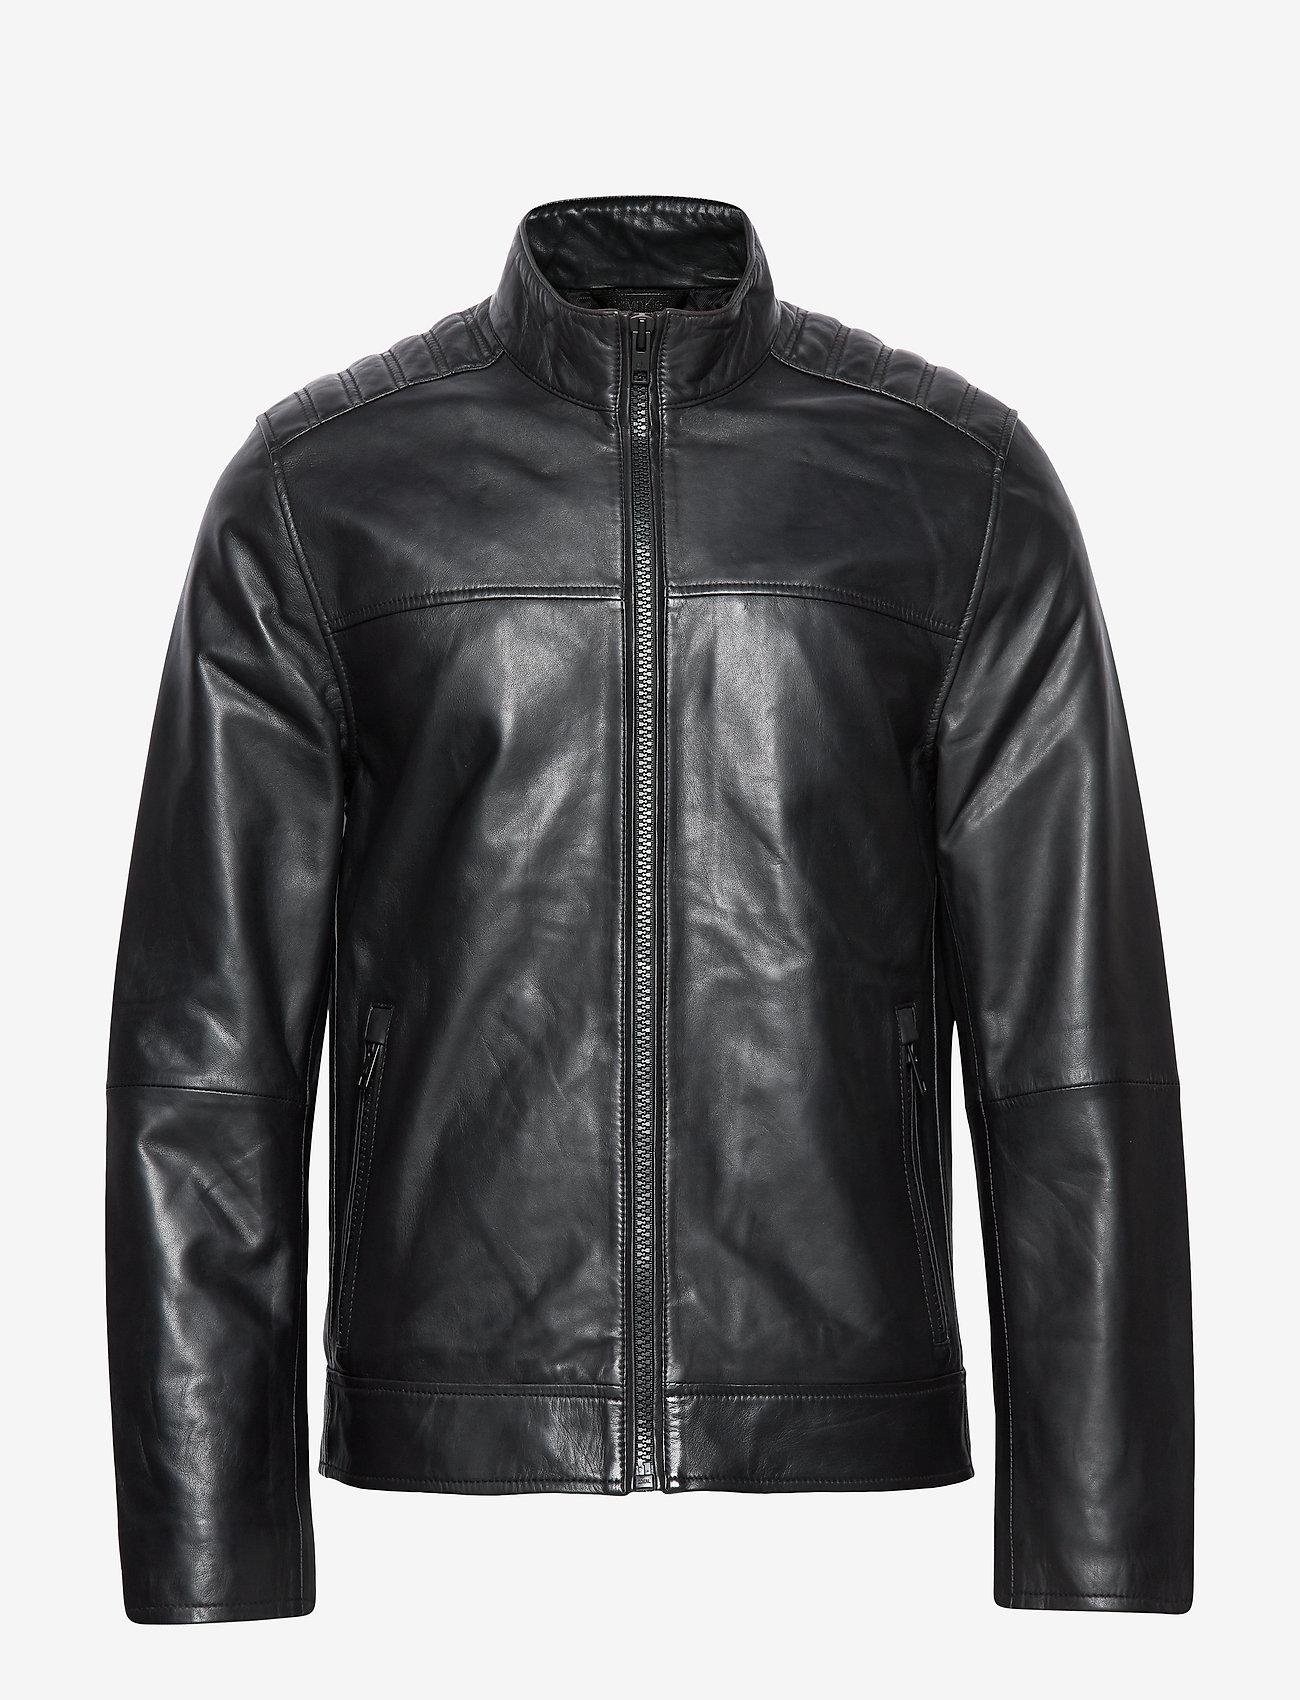 Calvin Klein - NAPPA BIKER - lederjacken - calvin black - 0